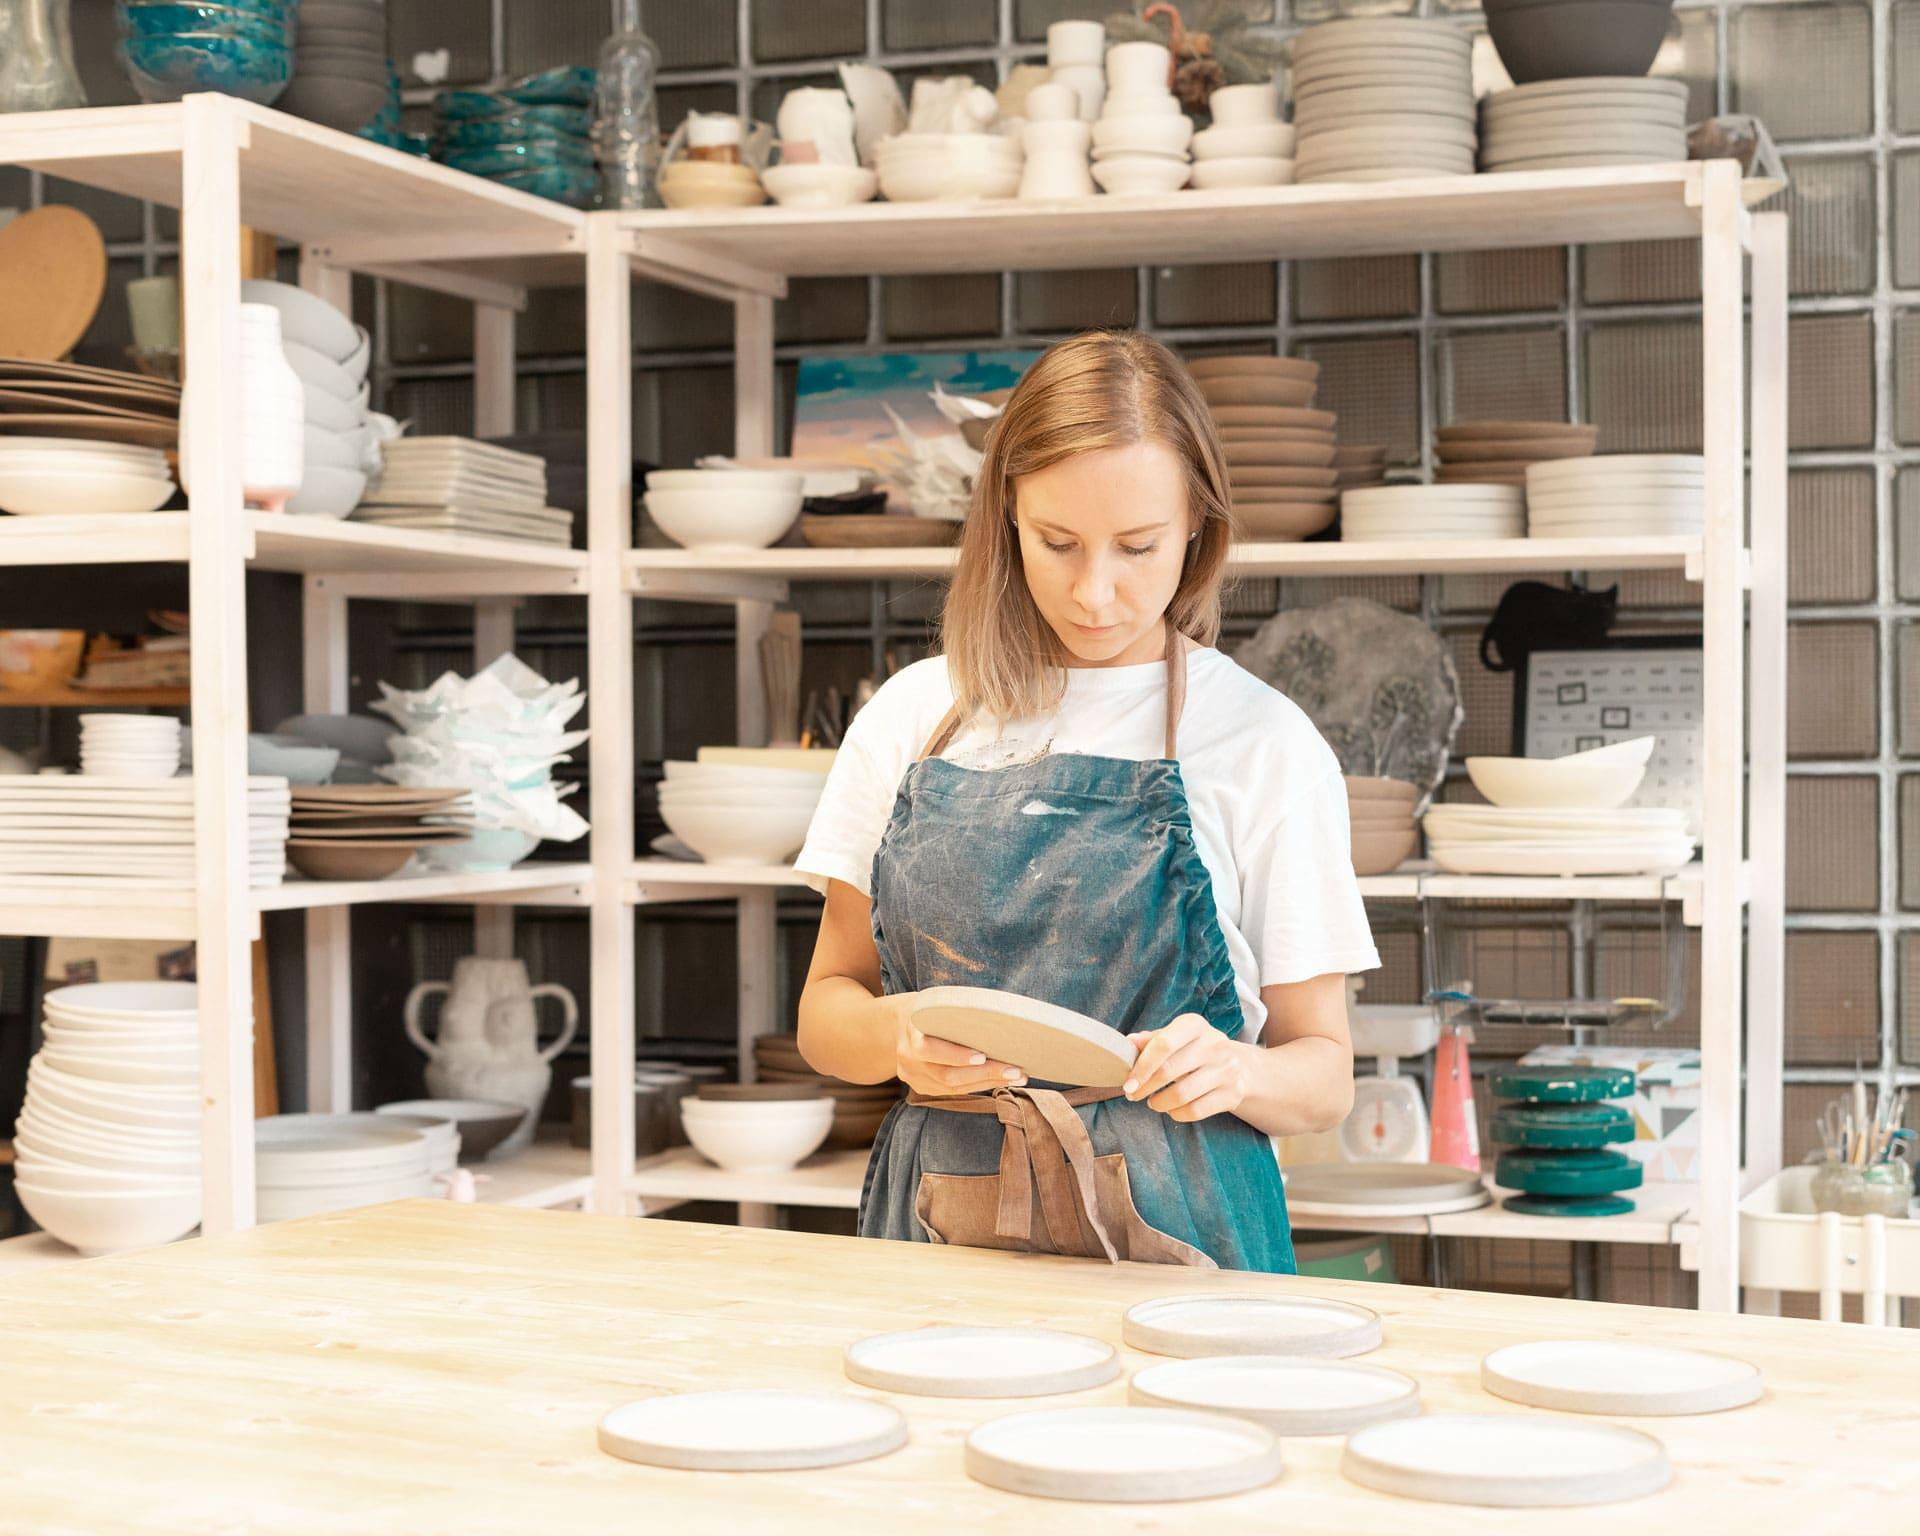 handcraft-product-earn-extra-money-side-hustle-tur-KLYG563-min